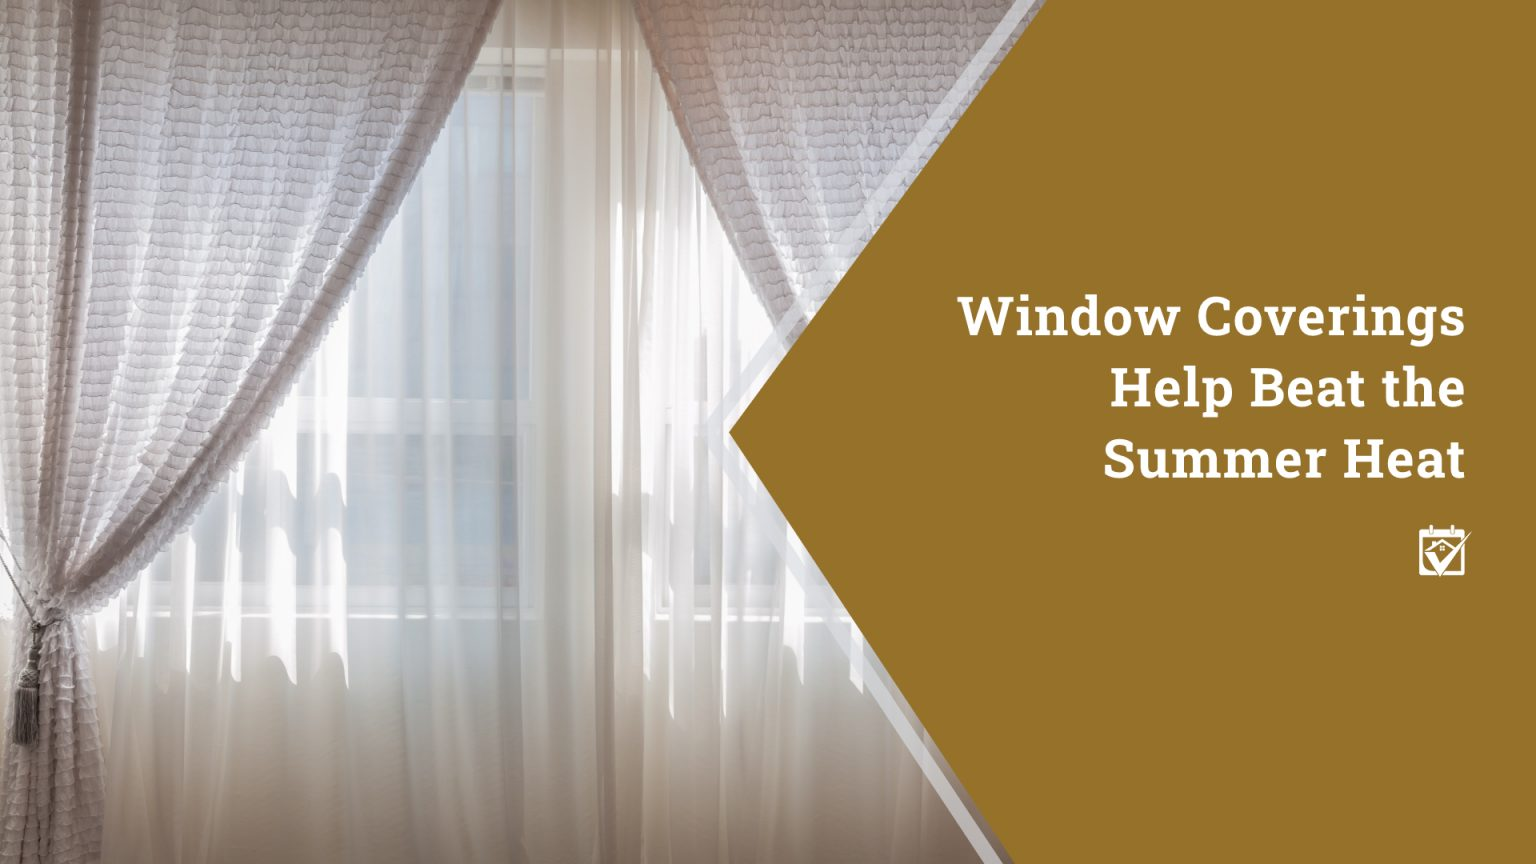 Window Coverings Help Beat the Summer Heat